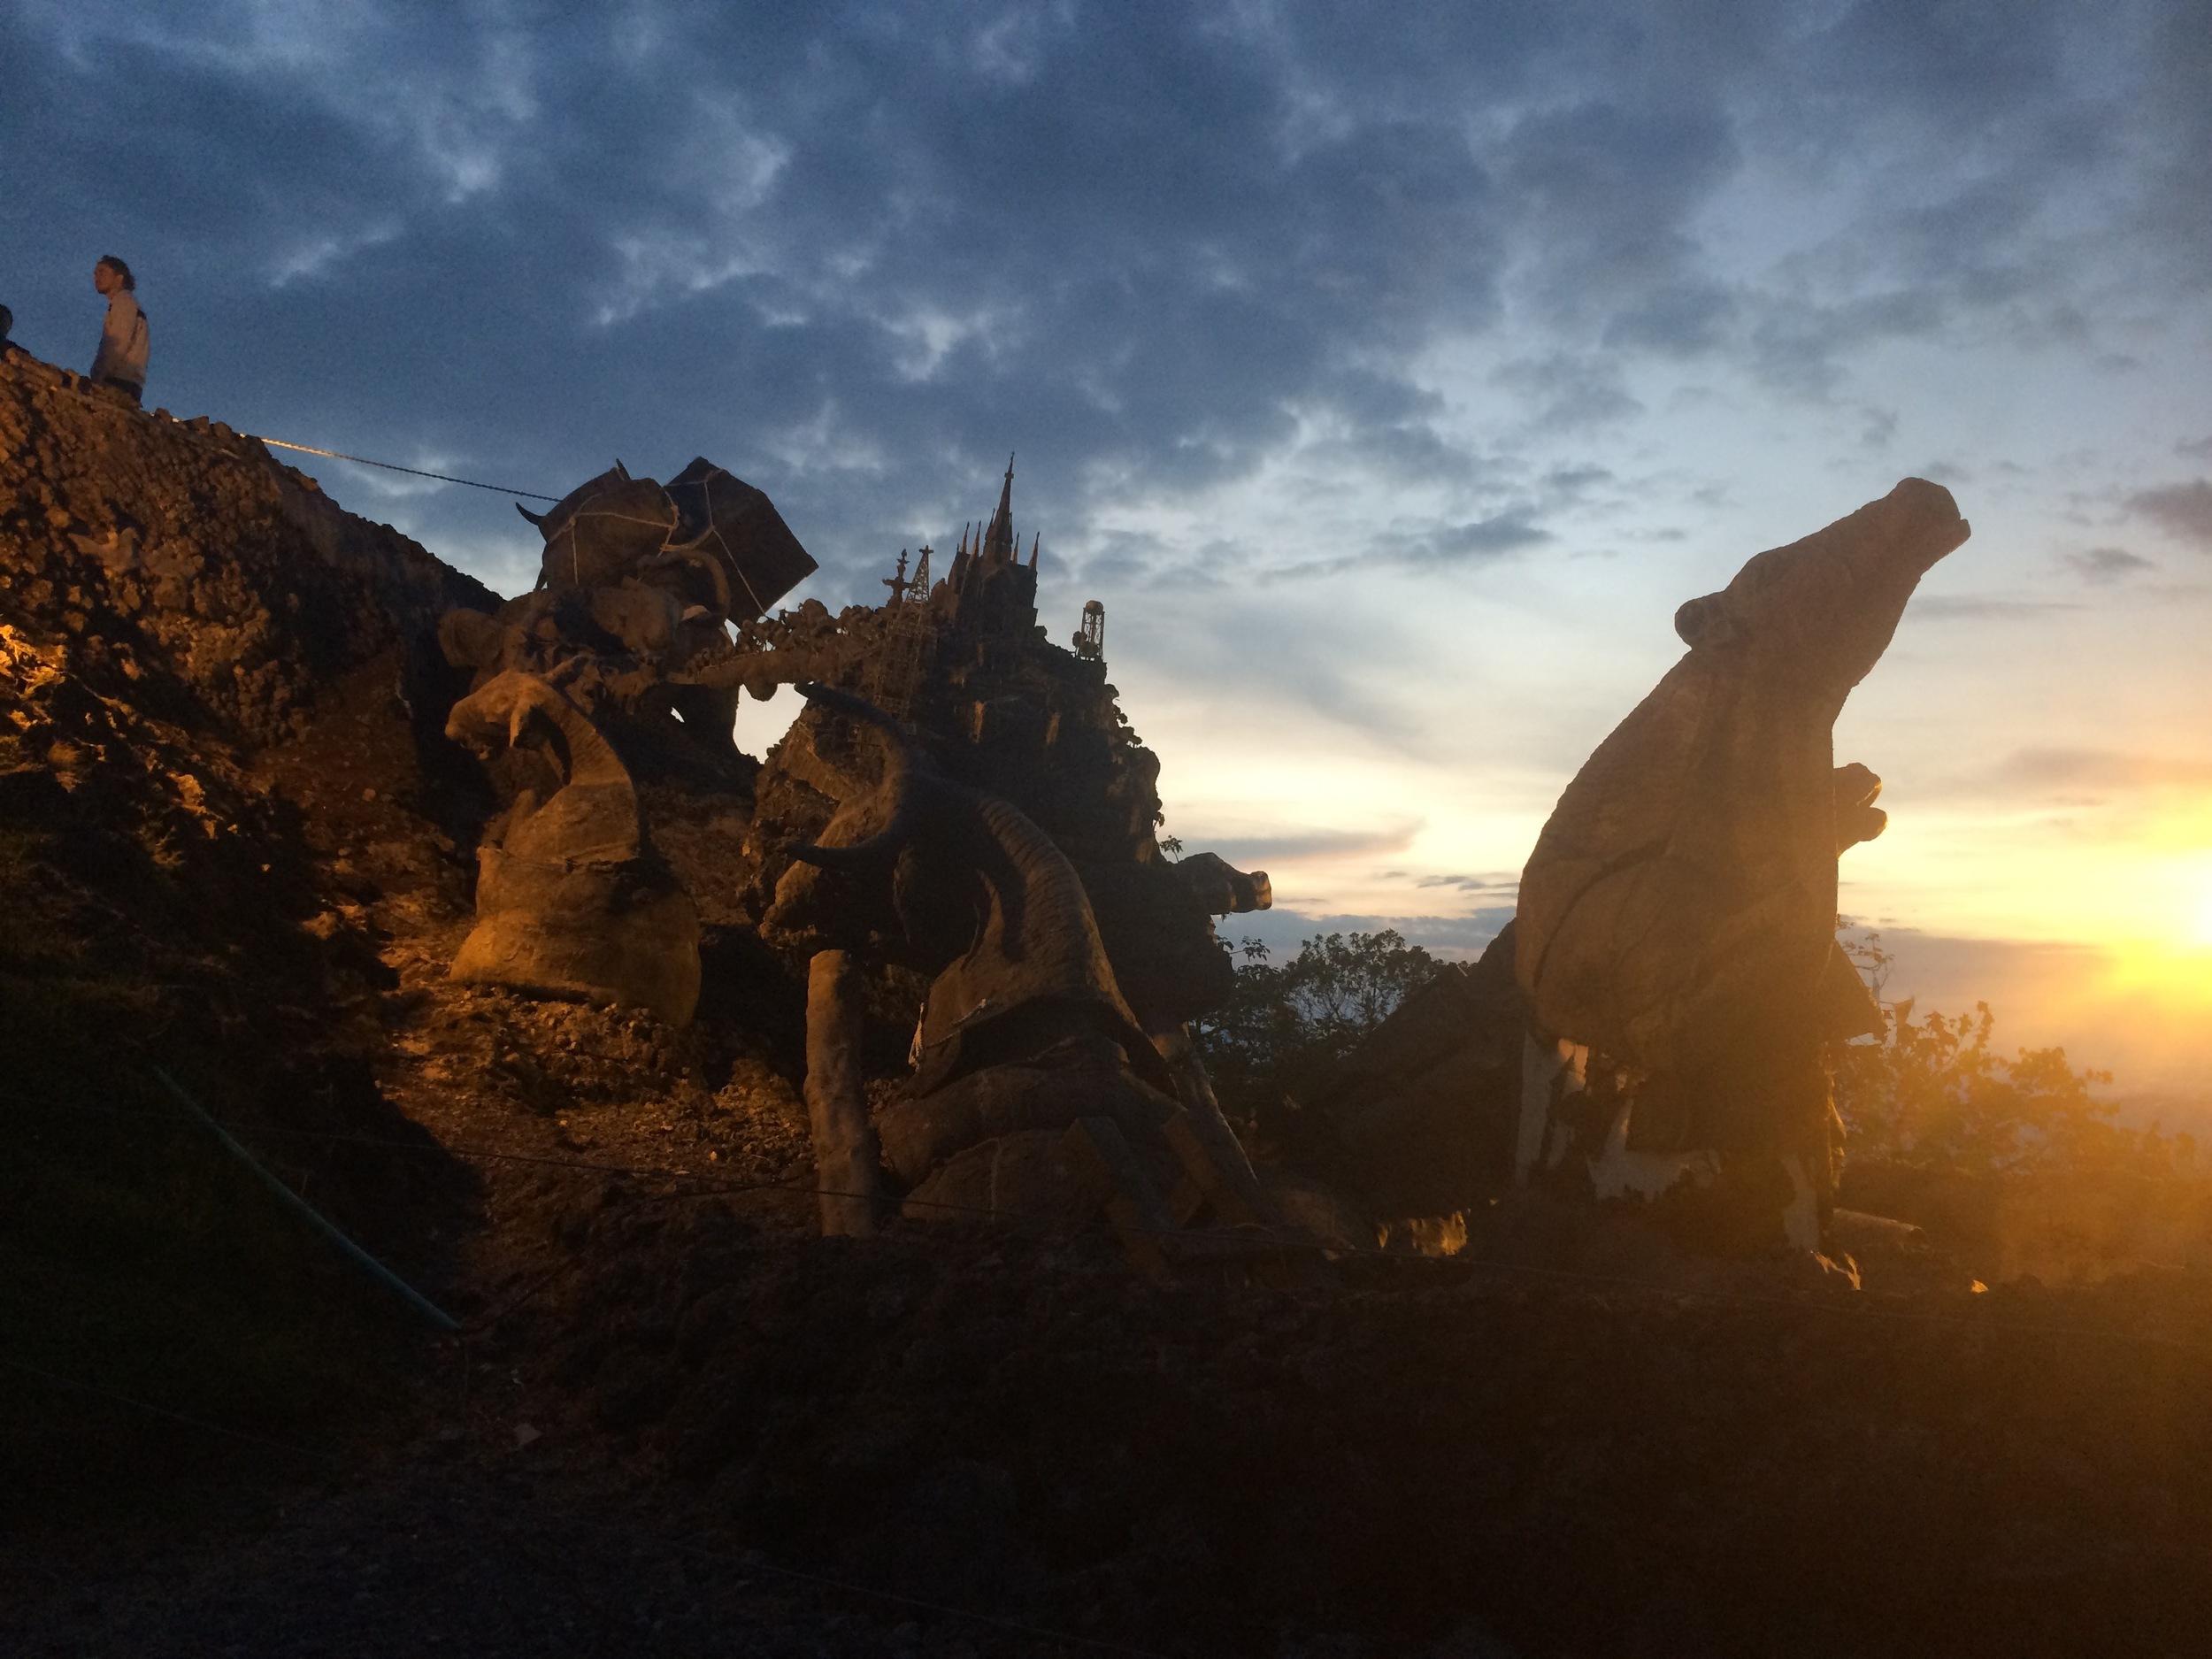 Memorial in Manizales